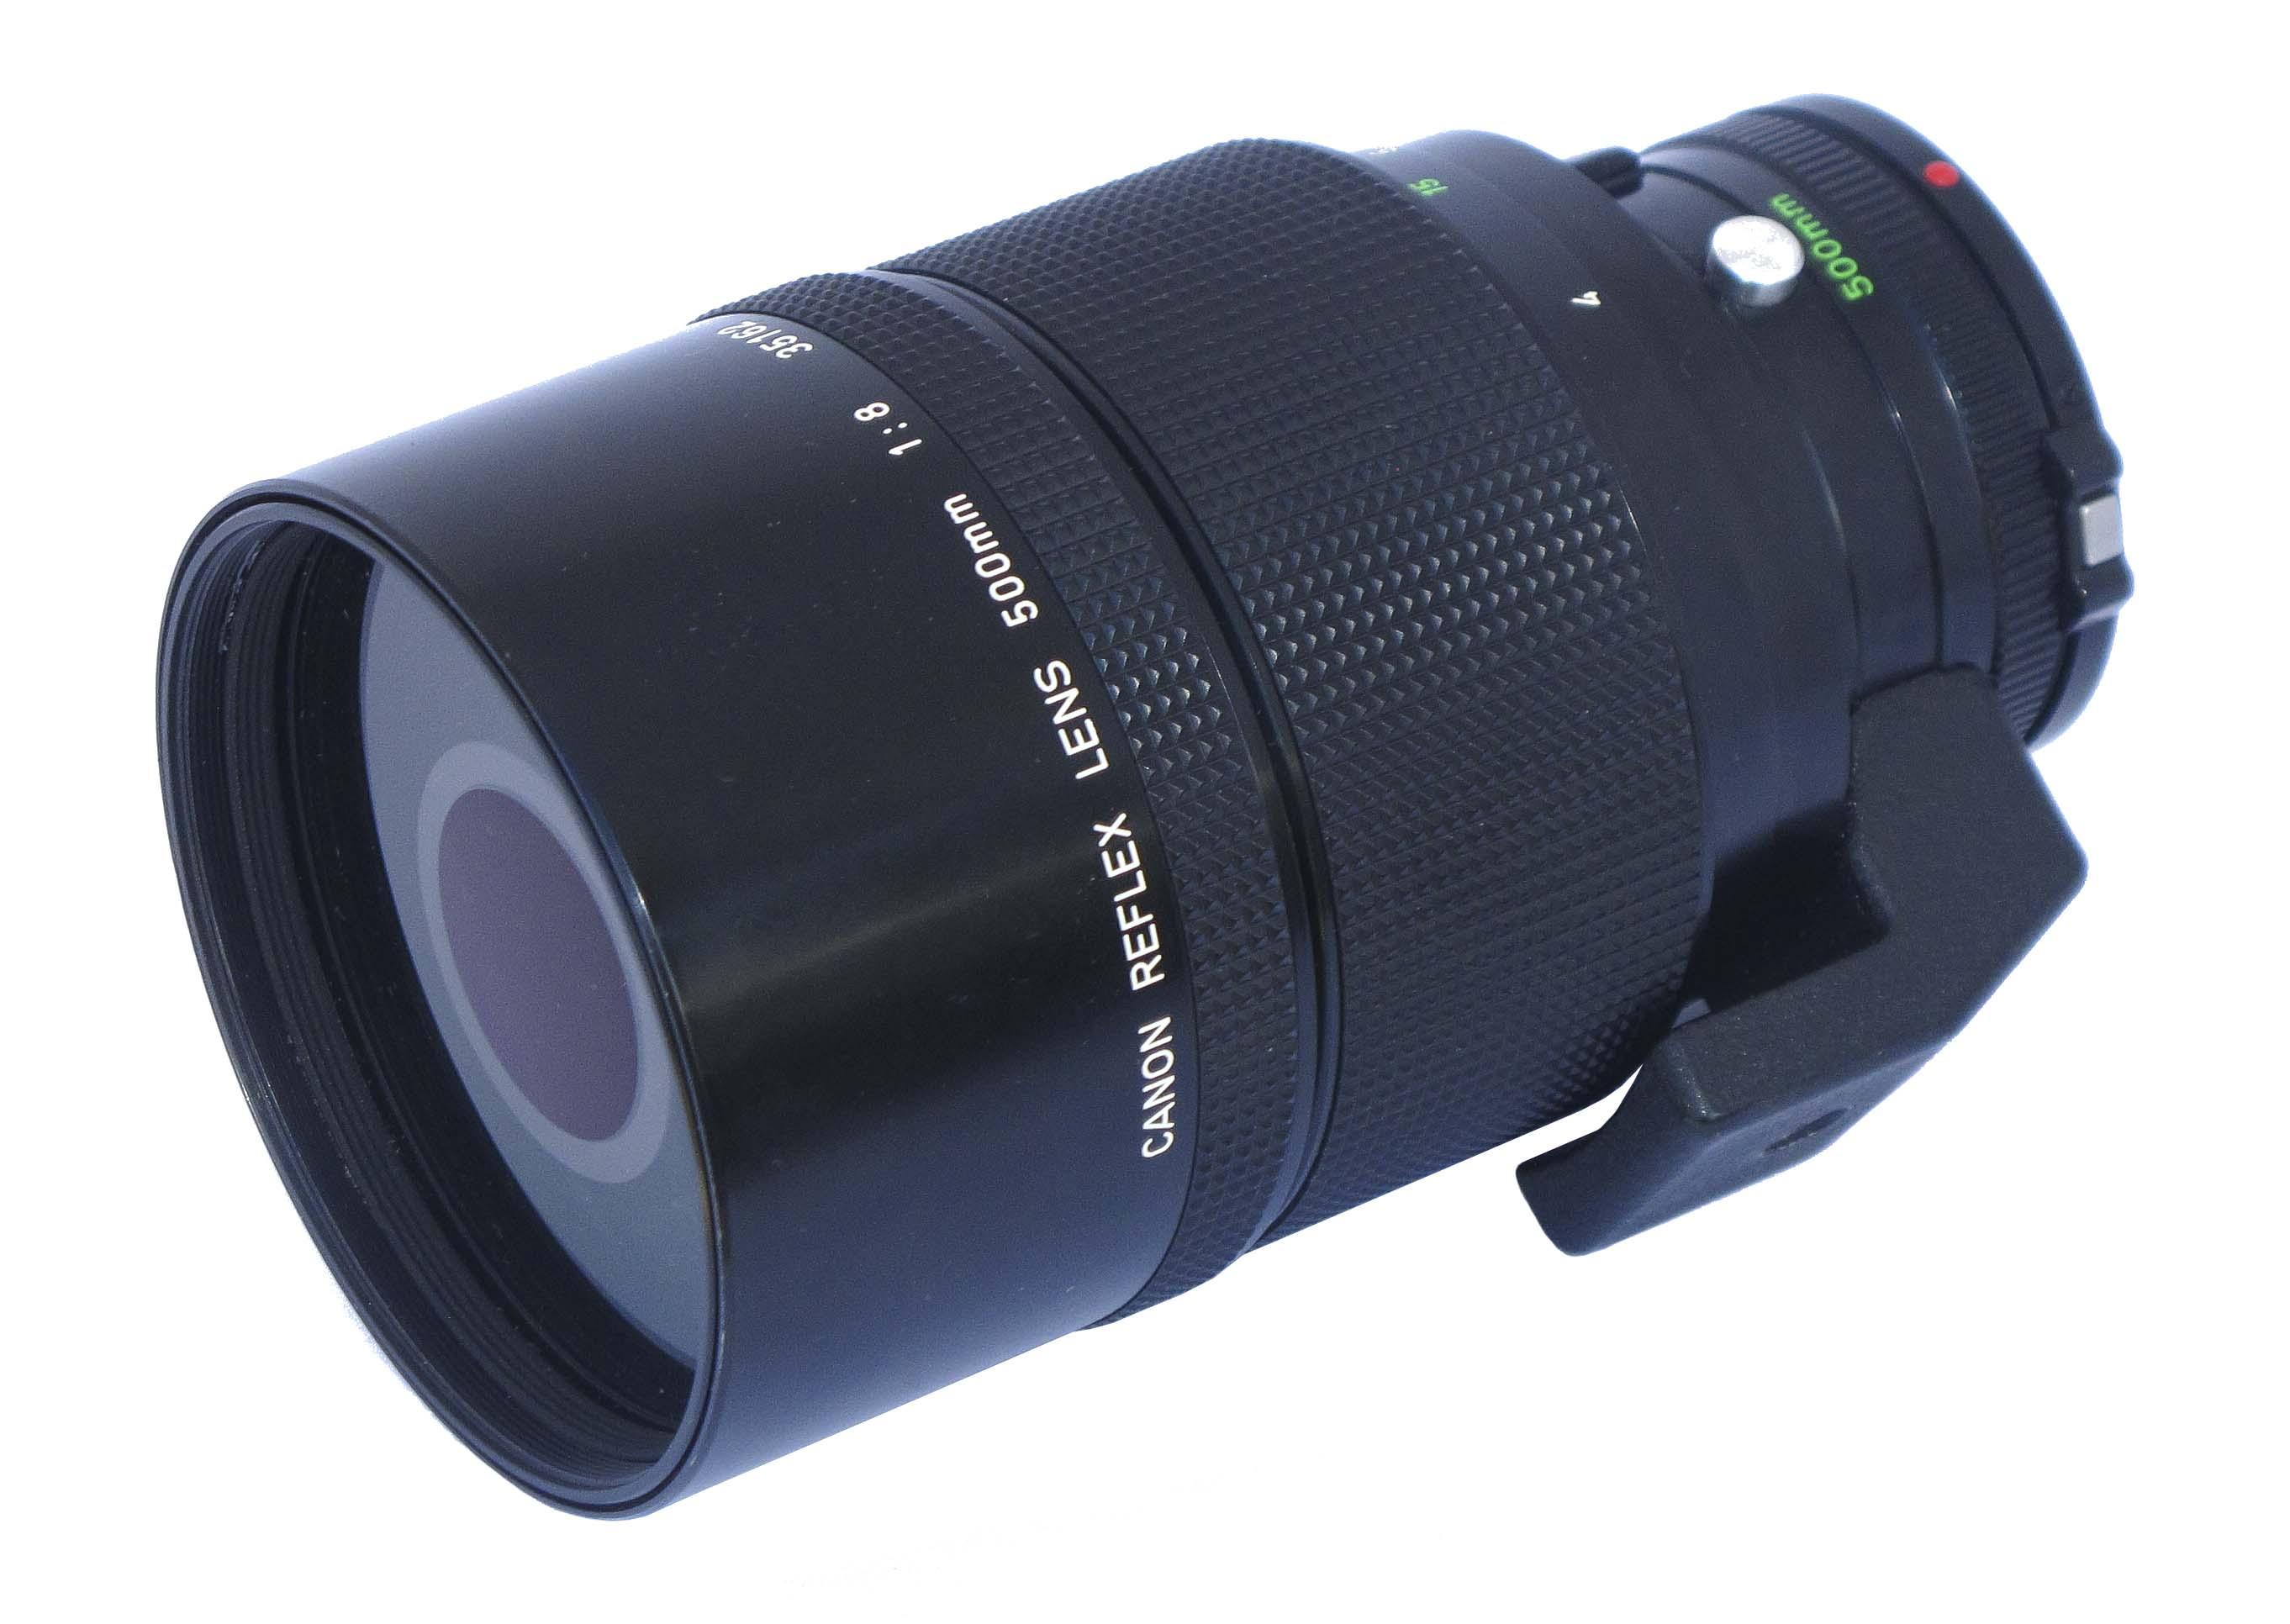 Canon FDn 500mm f/8.0 Reflex Lens